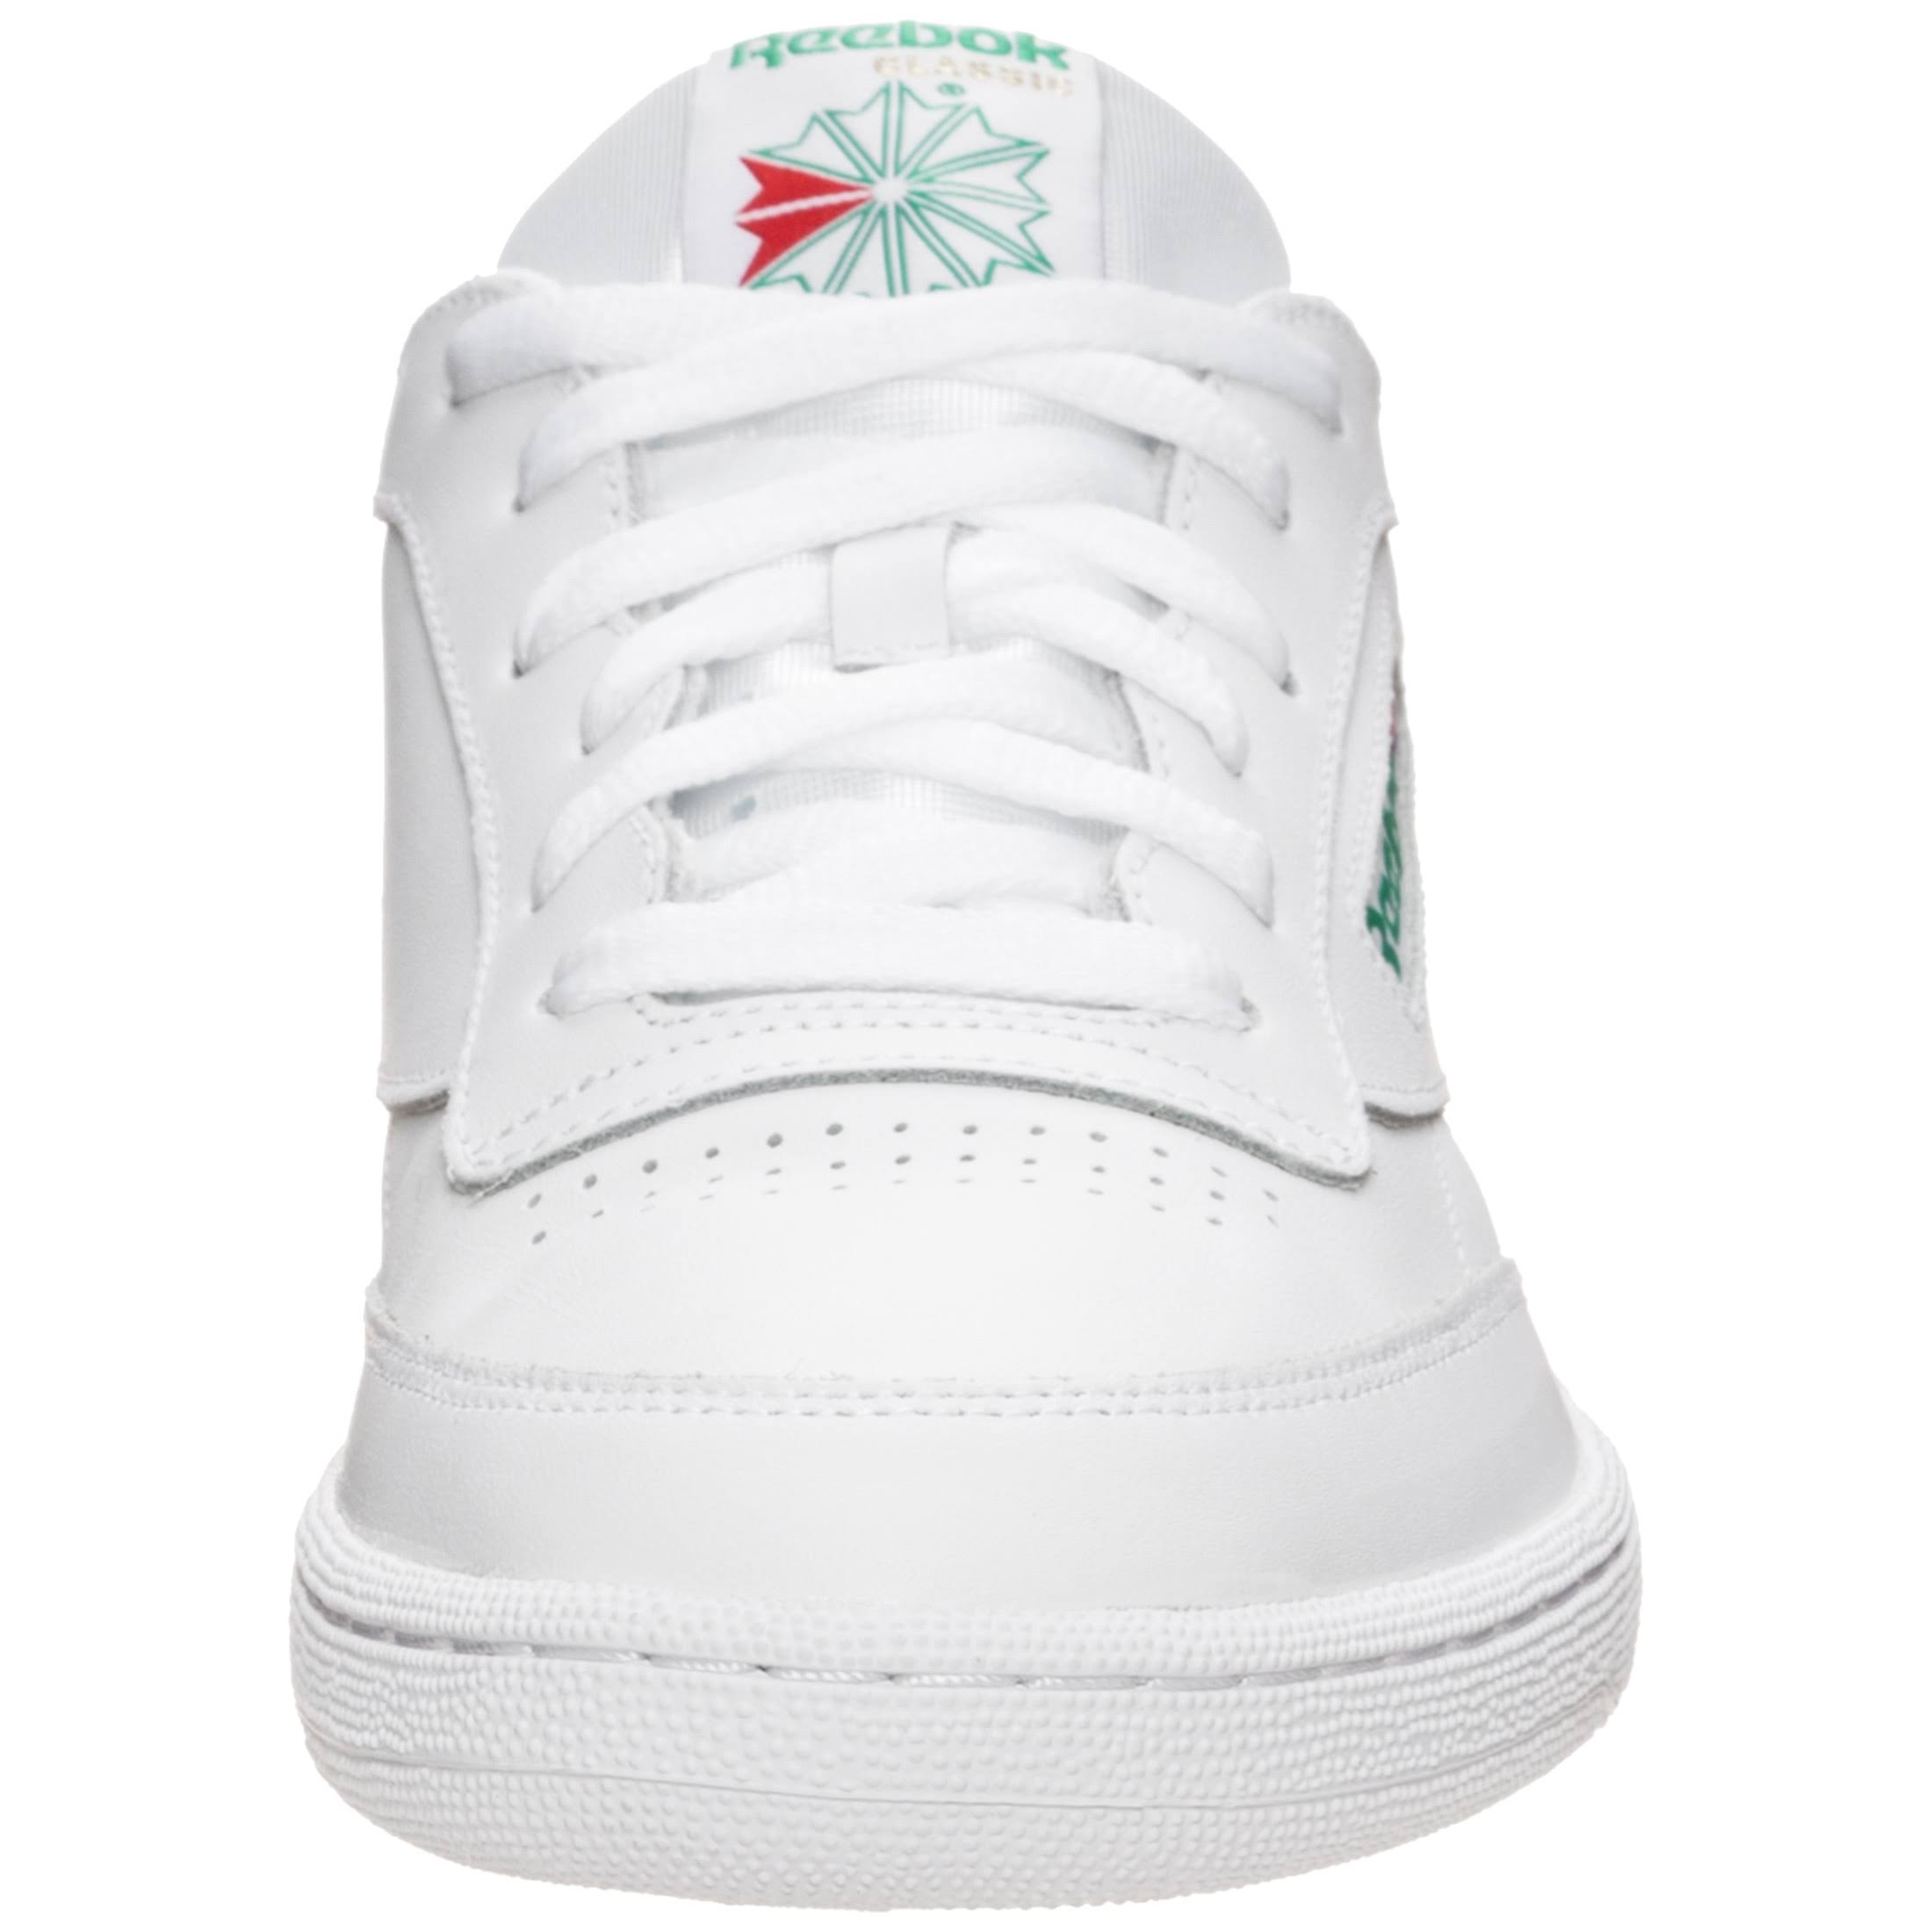 White Club green – Sneaker Ar0456 C Reebok 85 Weiße 50w6nqPq4T